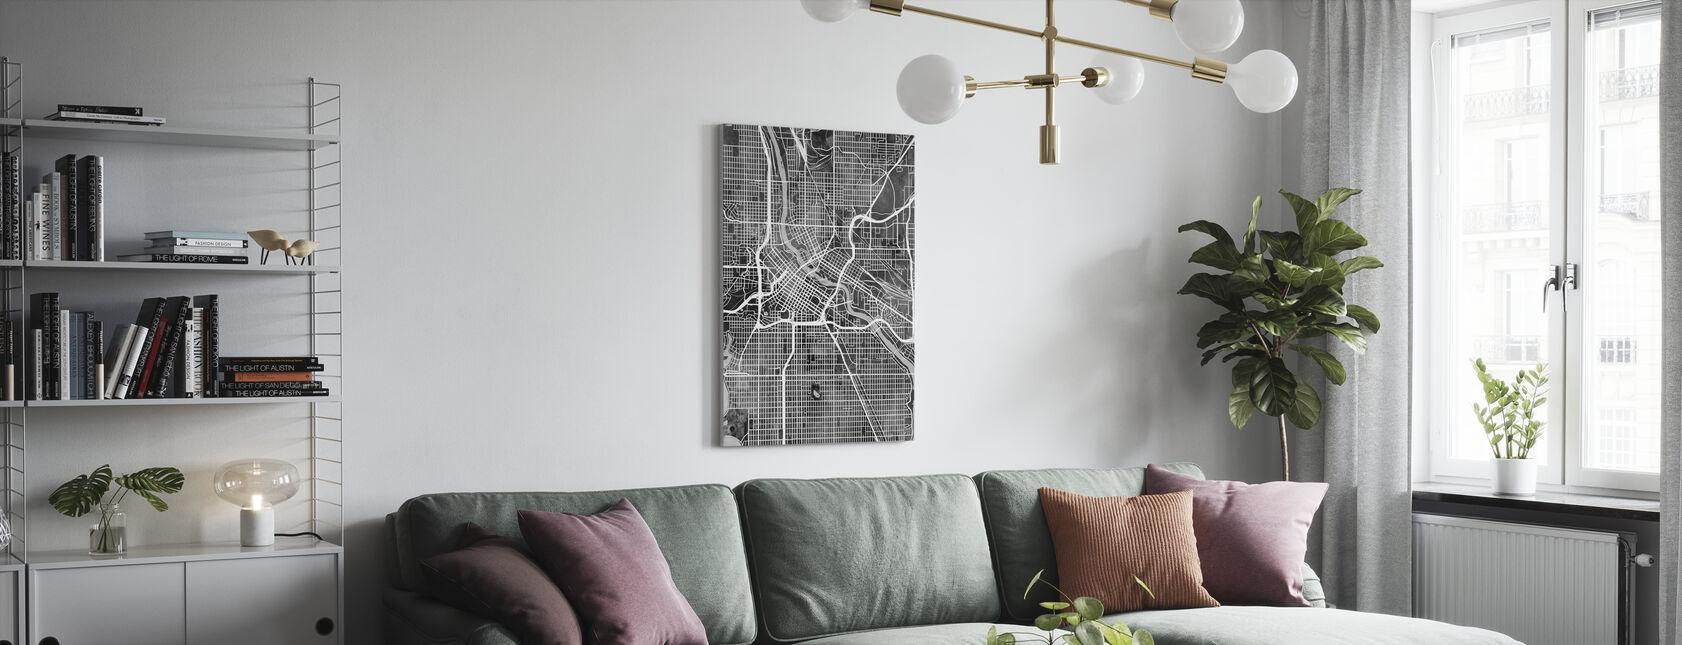 Minneapolis Minnesota City Kaart - Canvas print - Woonkamer